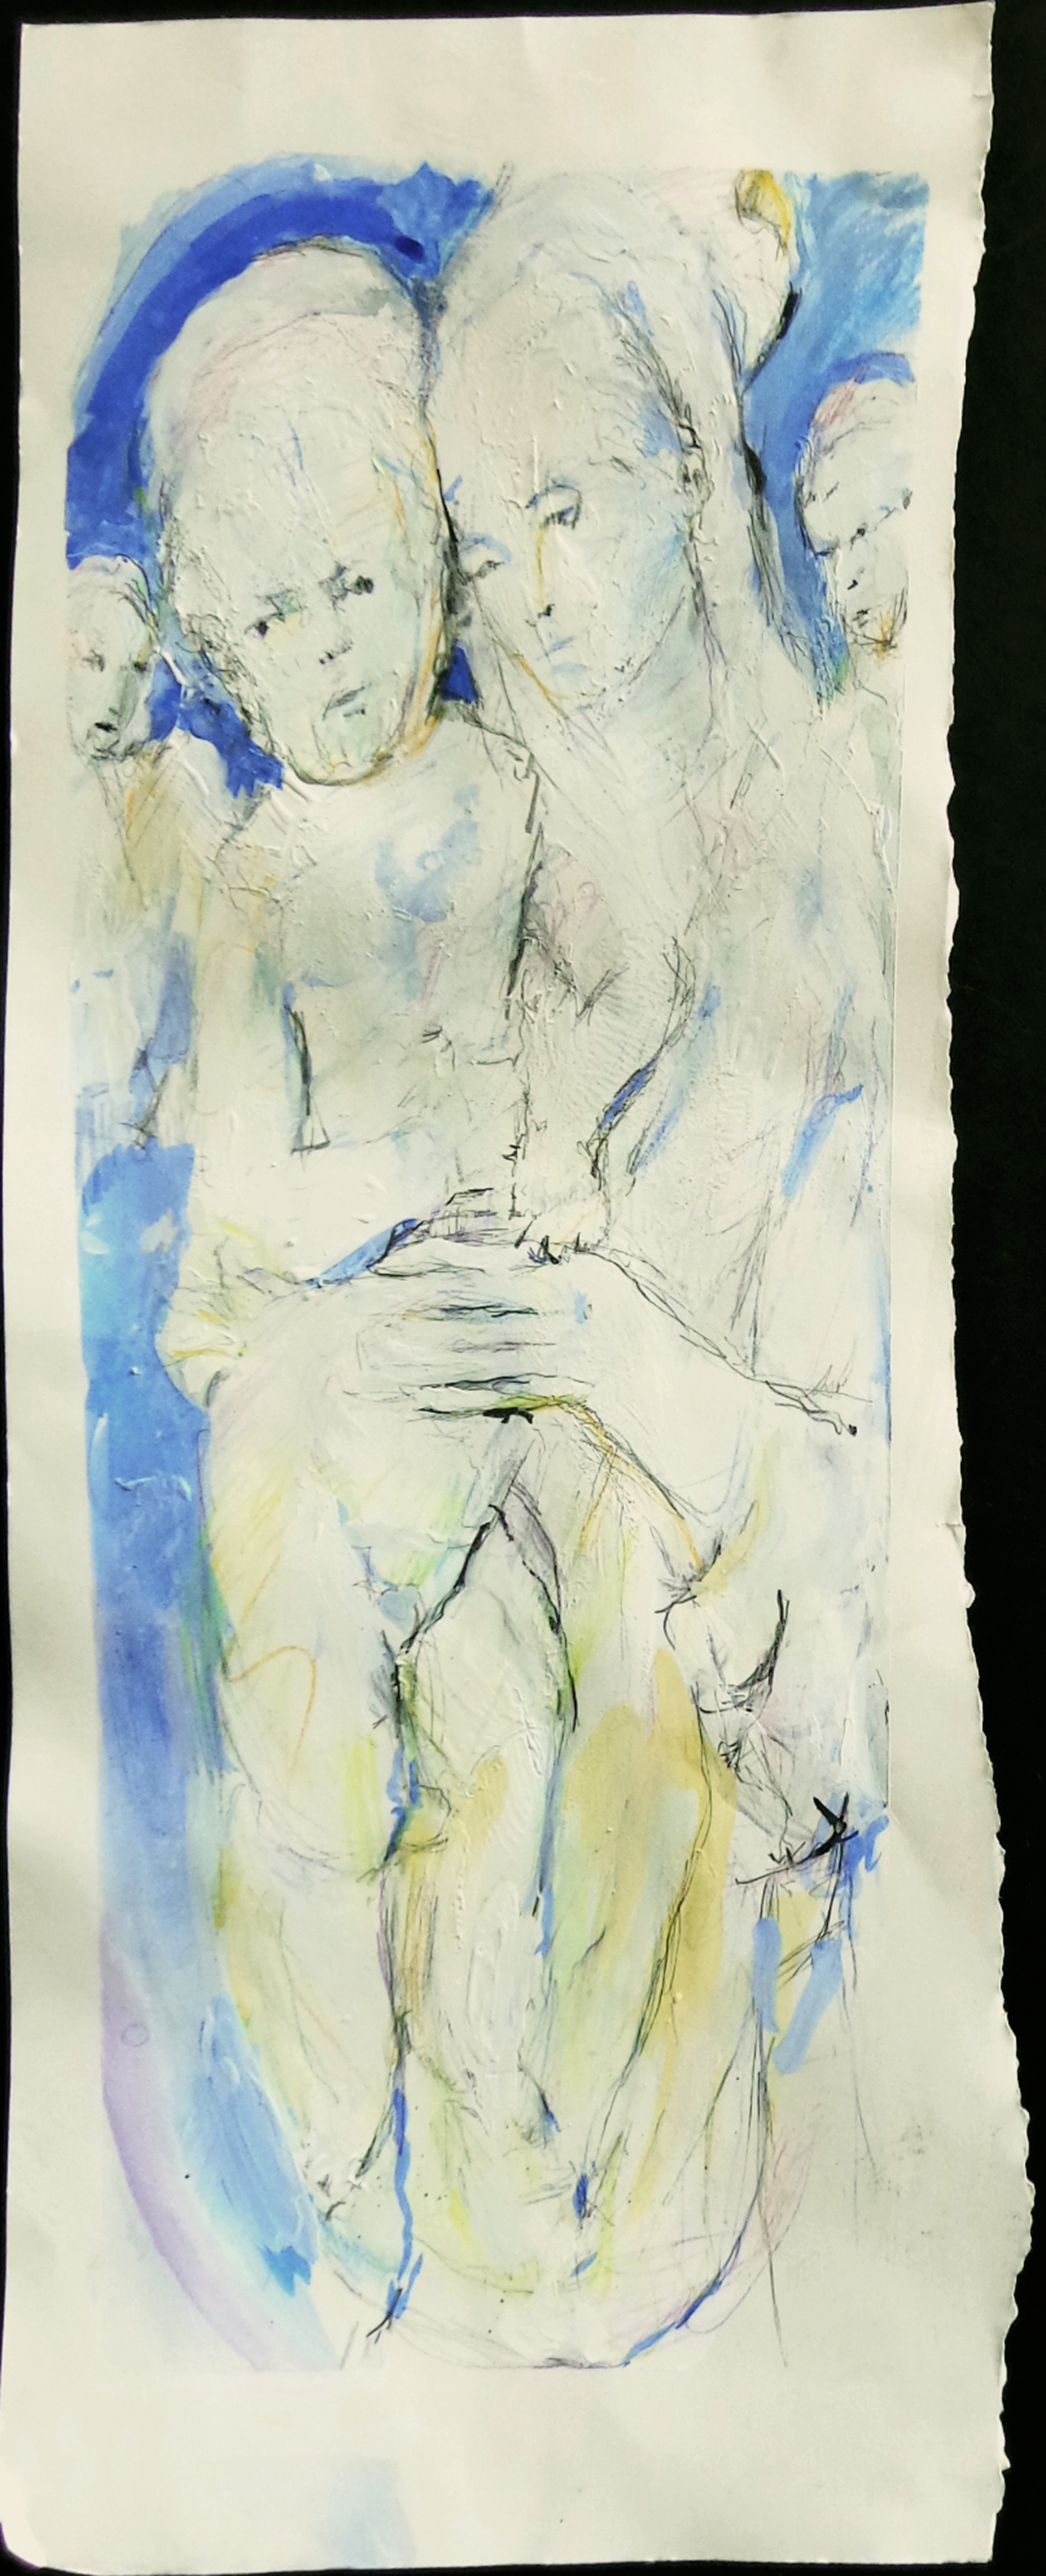 "Madonna and Christ Child [blue-orange 2] Ink, gesso, goauche, pencil on paper, 24"" x 9"", 2018"